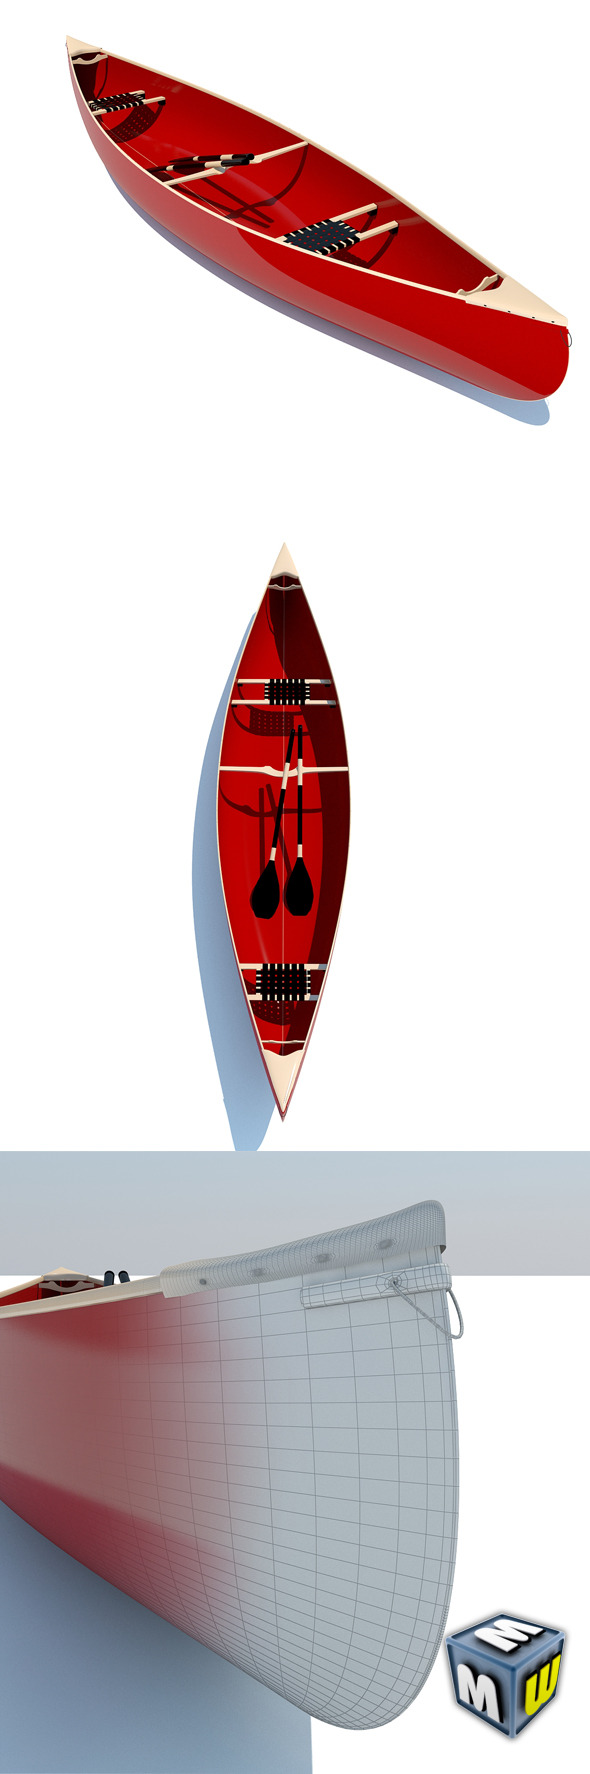 Canoe MAX 2011 - 3DOcean Item for Sale